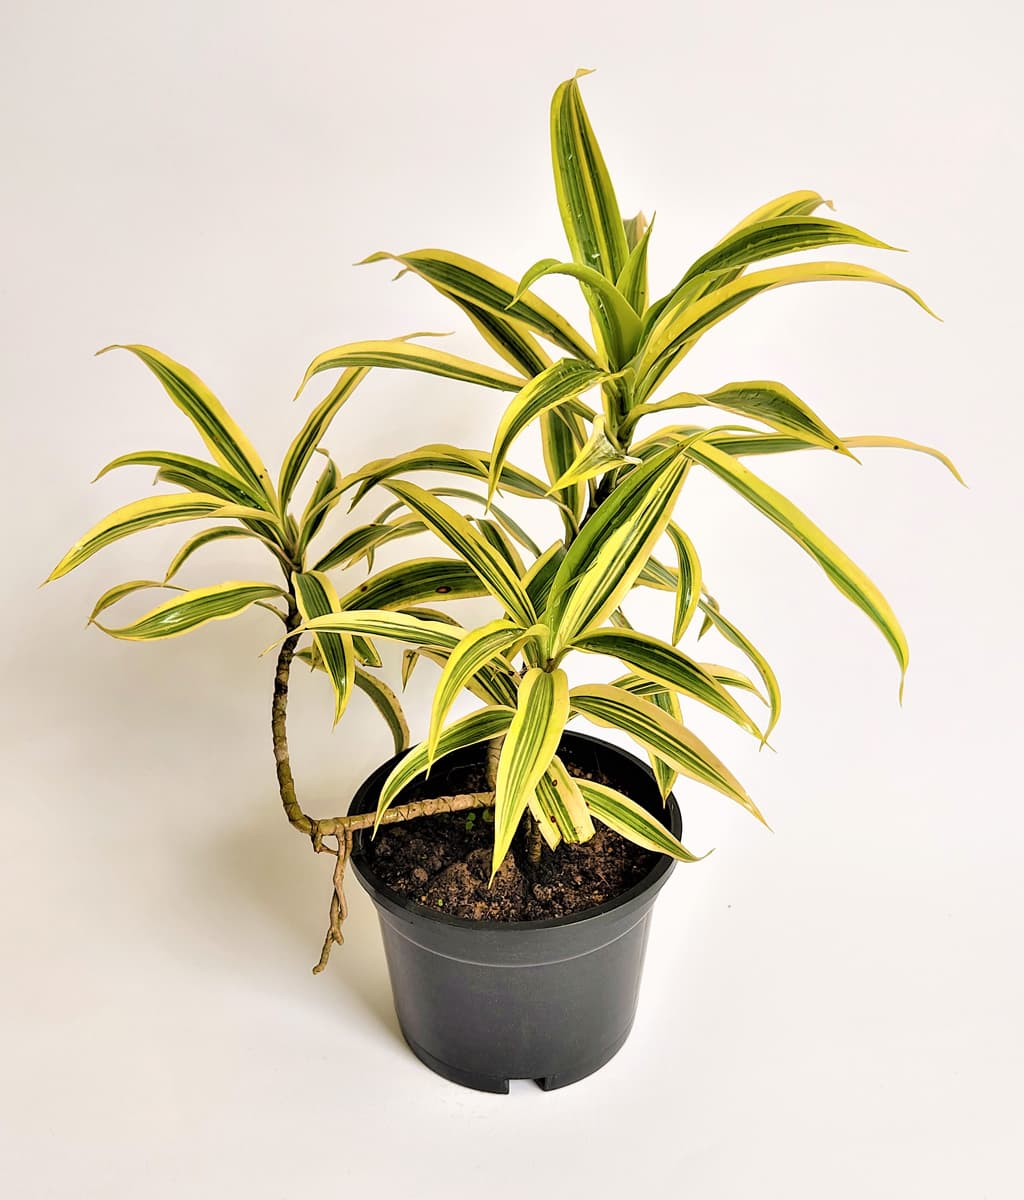 Dracaena Reflexa Song of India Peppyflora Product 01 a moz